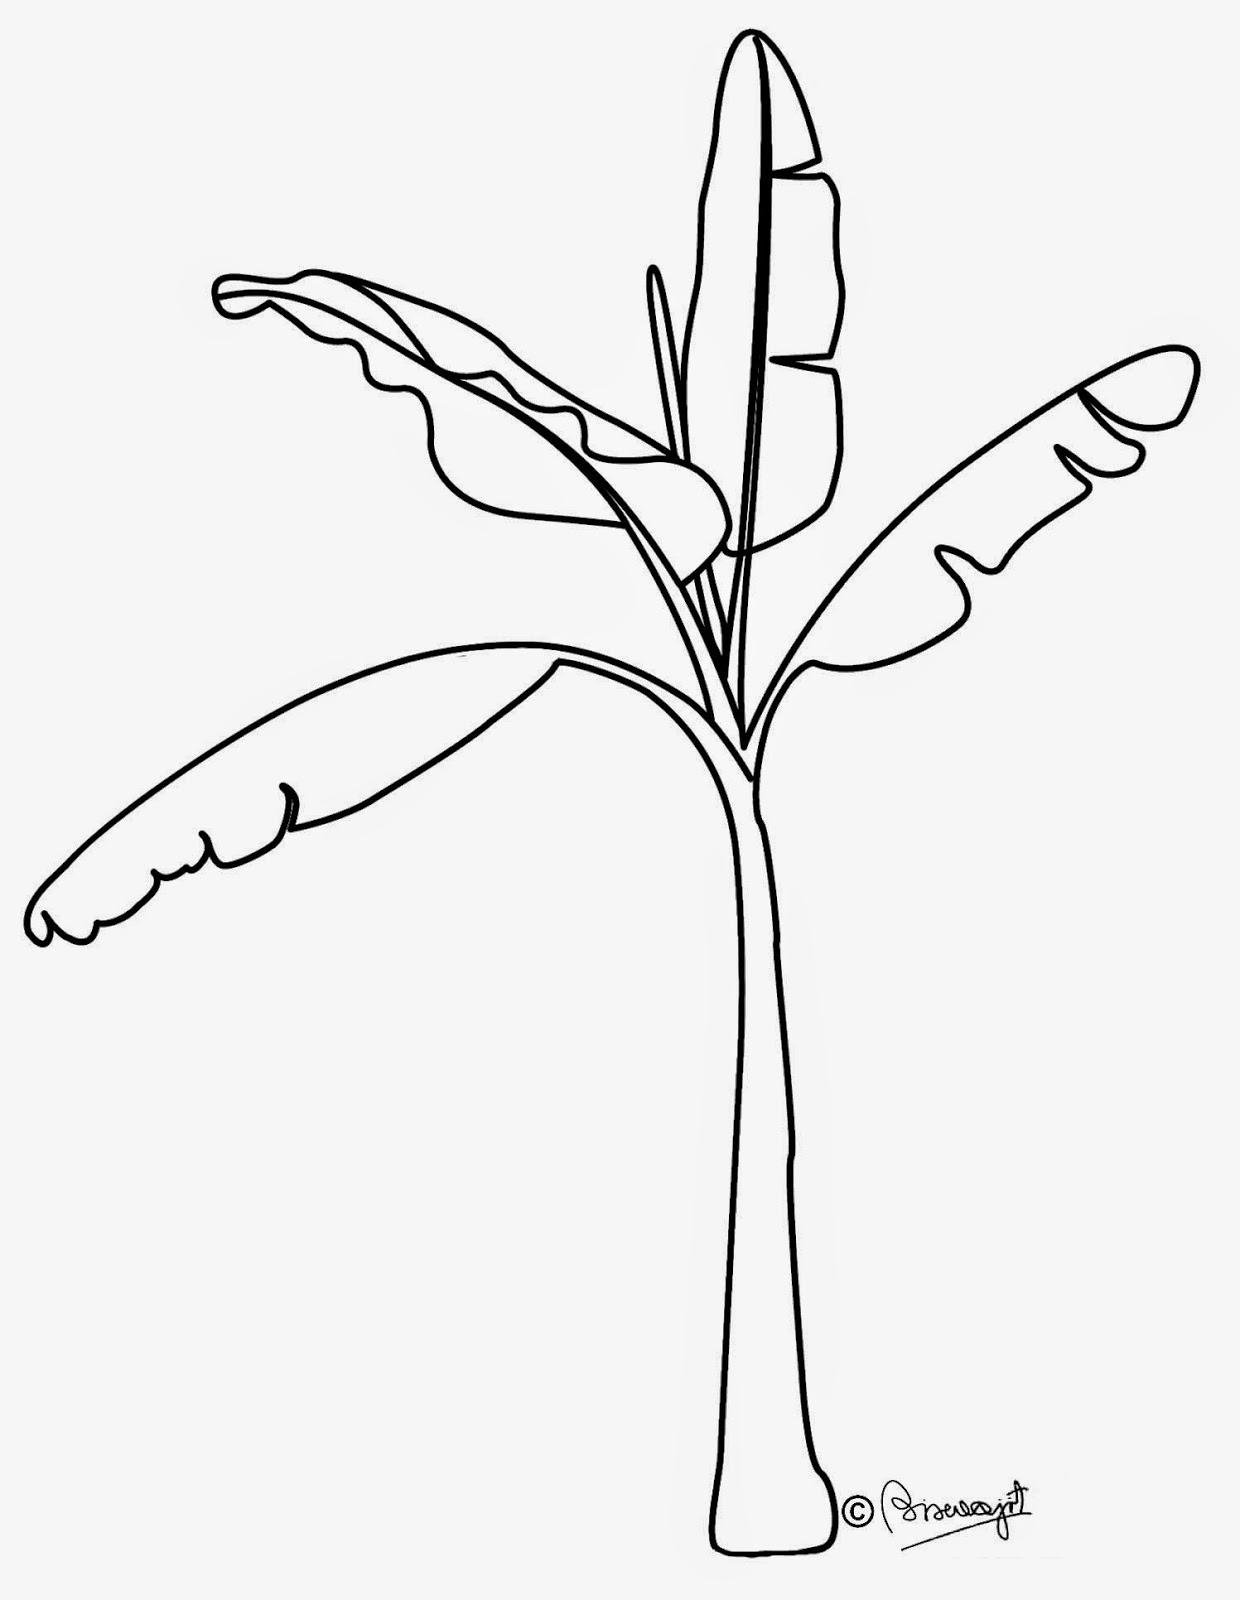 Black and white station. Banana clipart tree